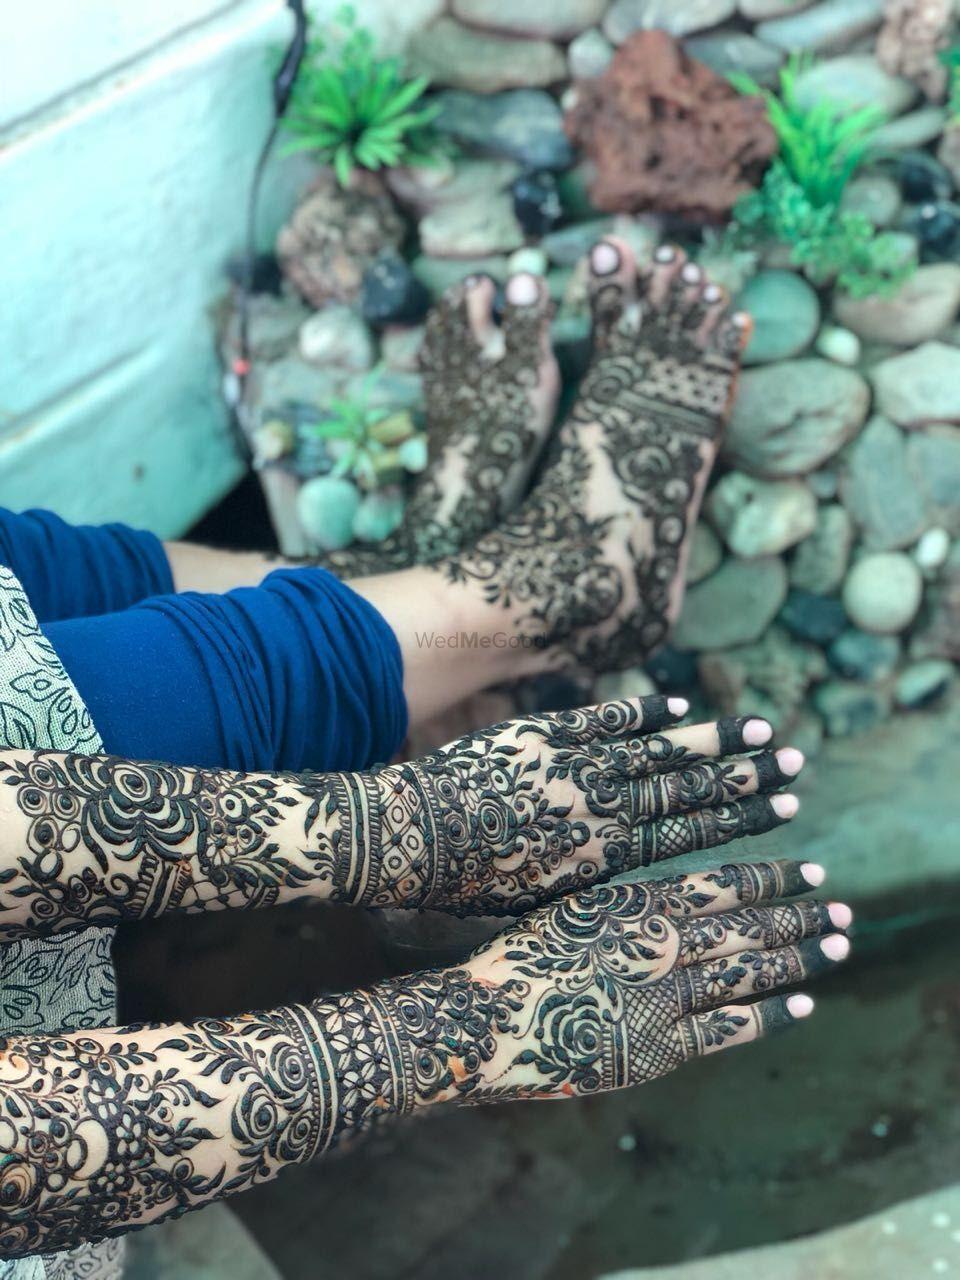 Photo By Maseera Mehendi Artist - Mehendi Artist